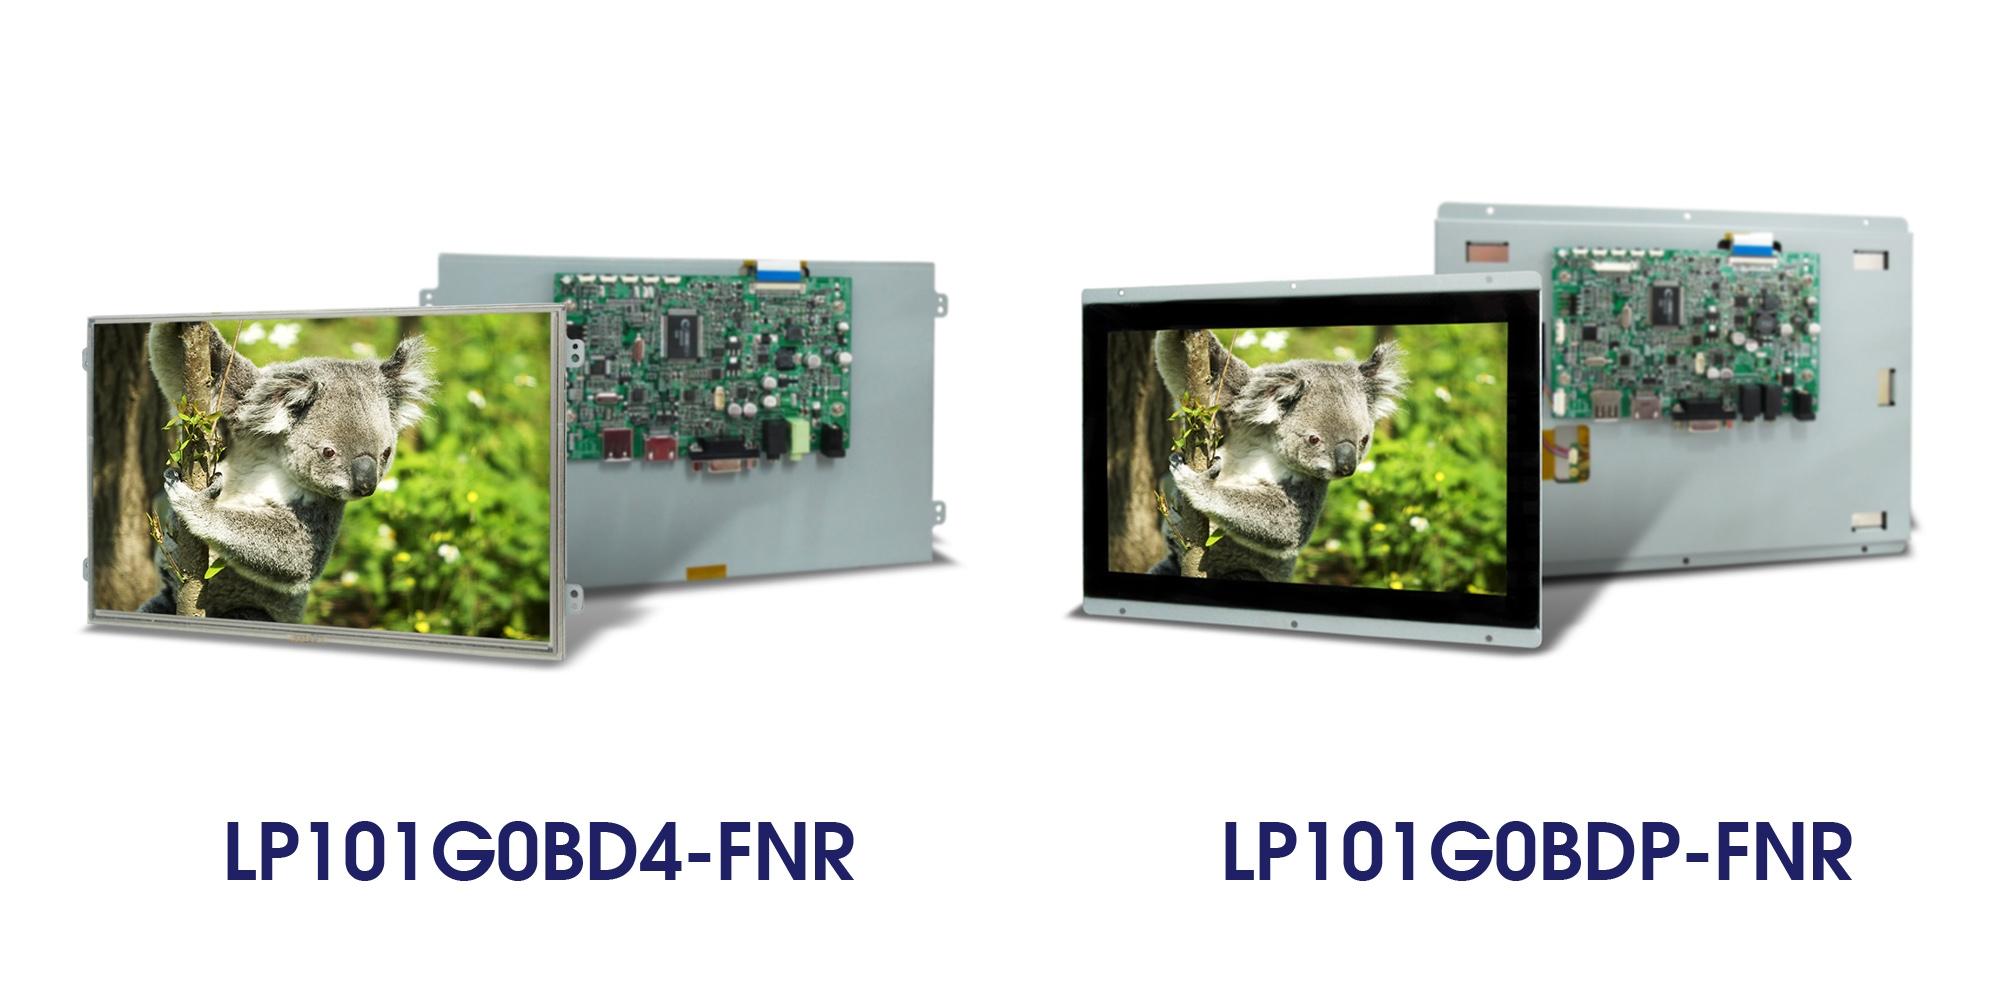 LP101G0BD4-FNRLP101G0BDP-FNR